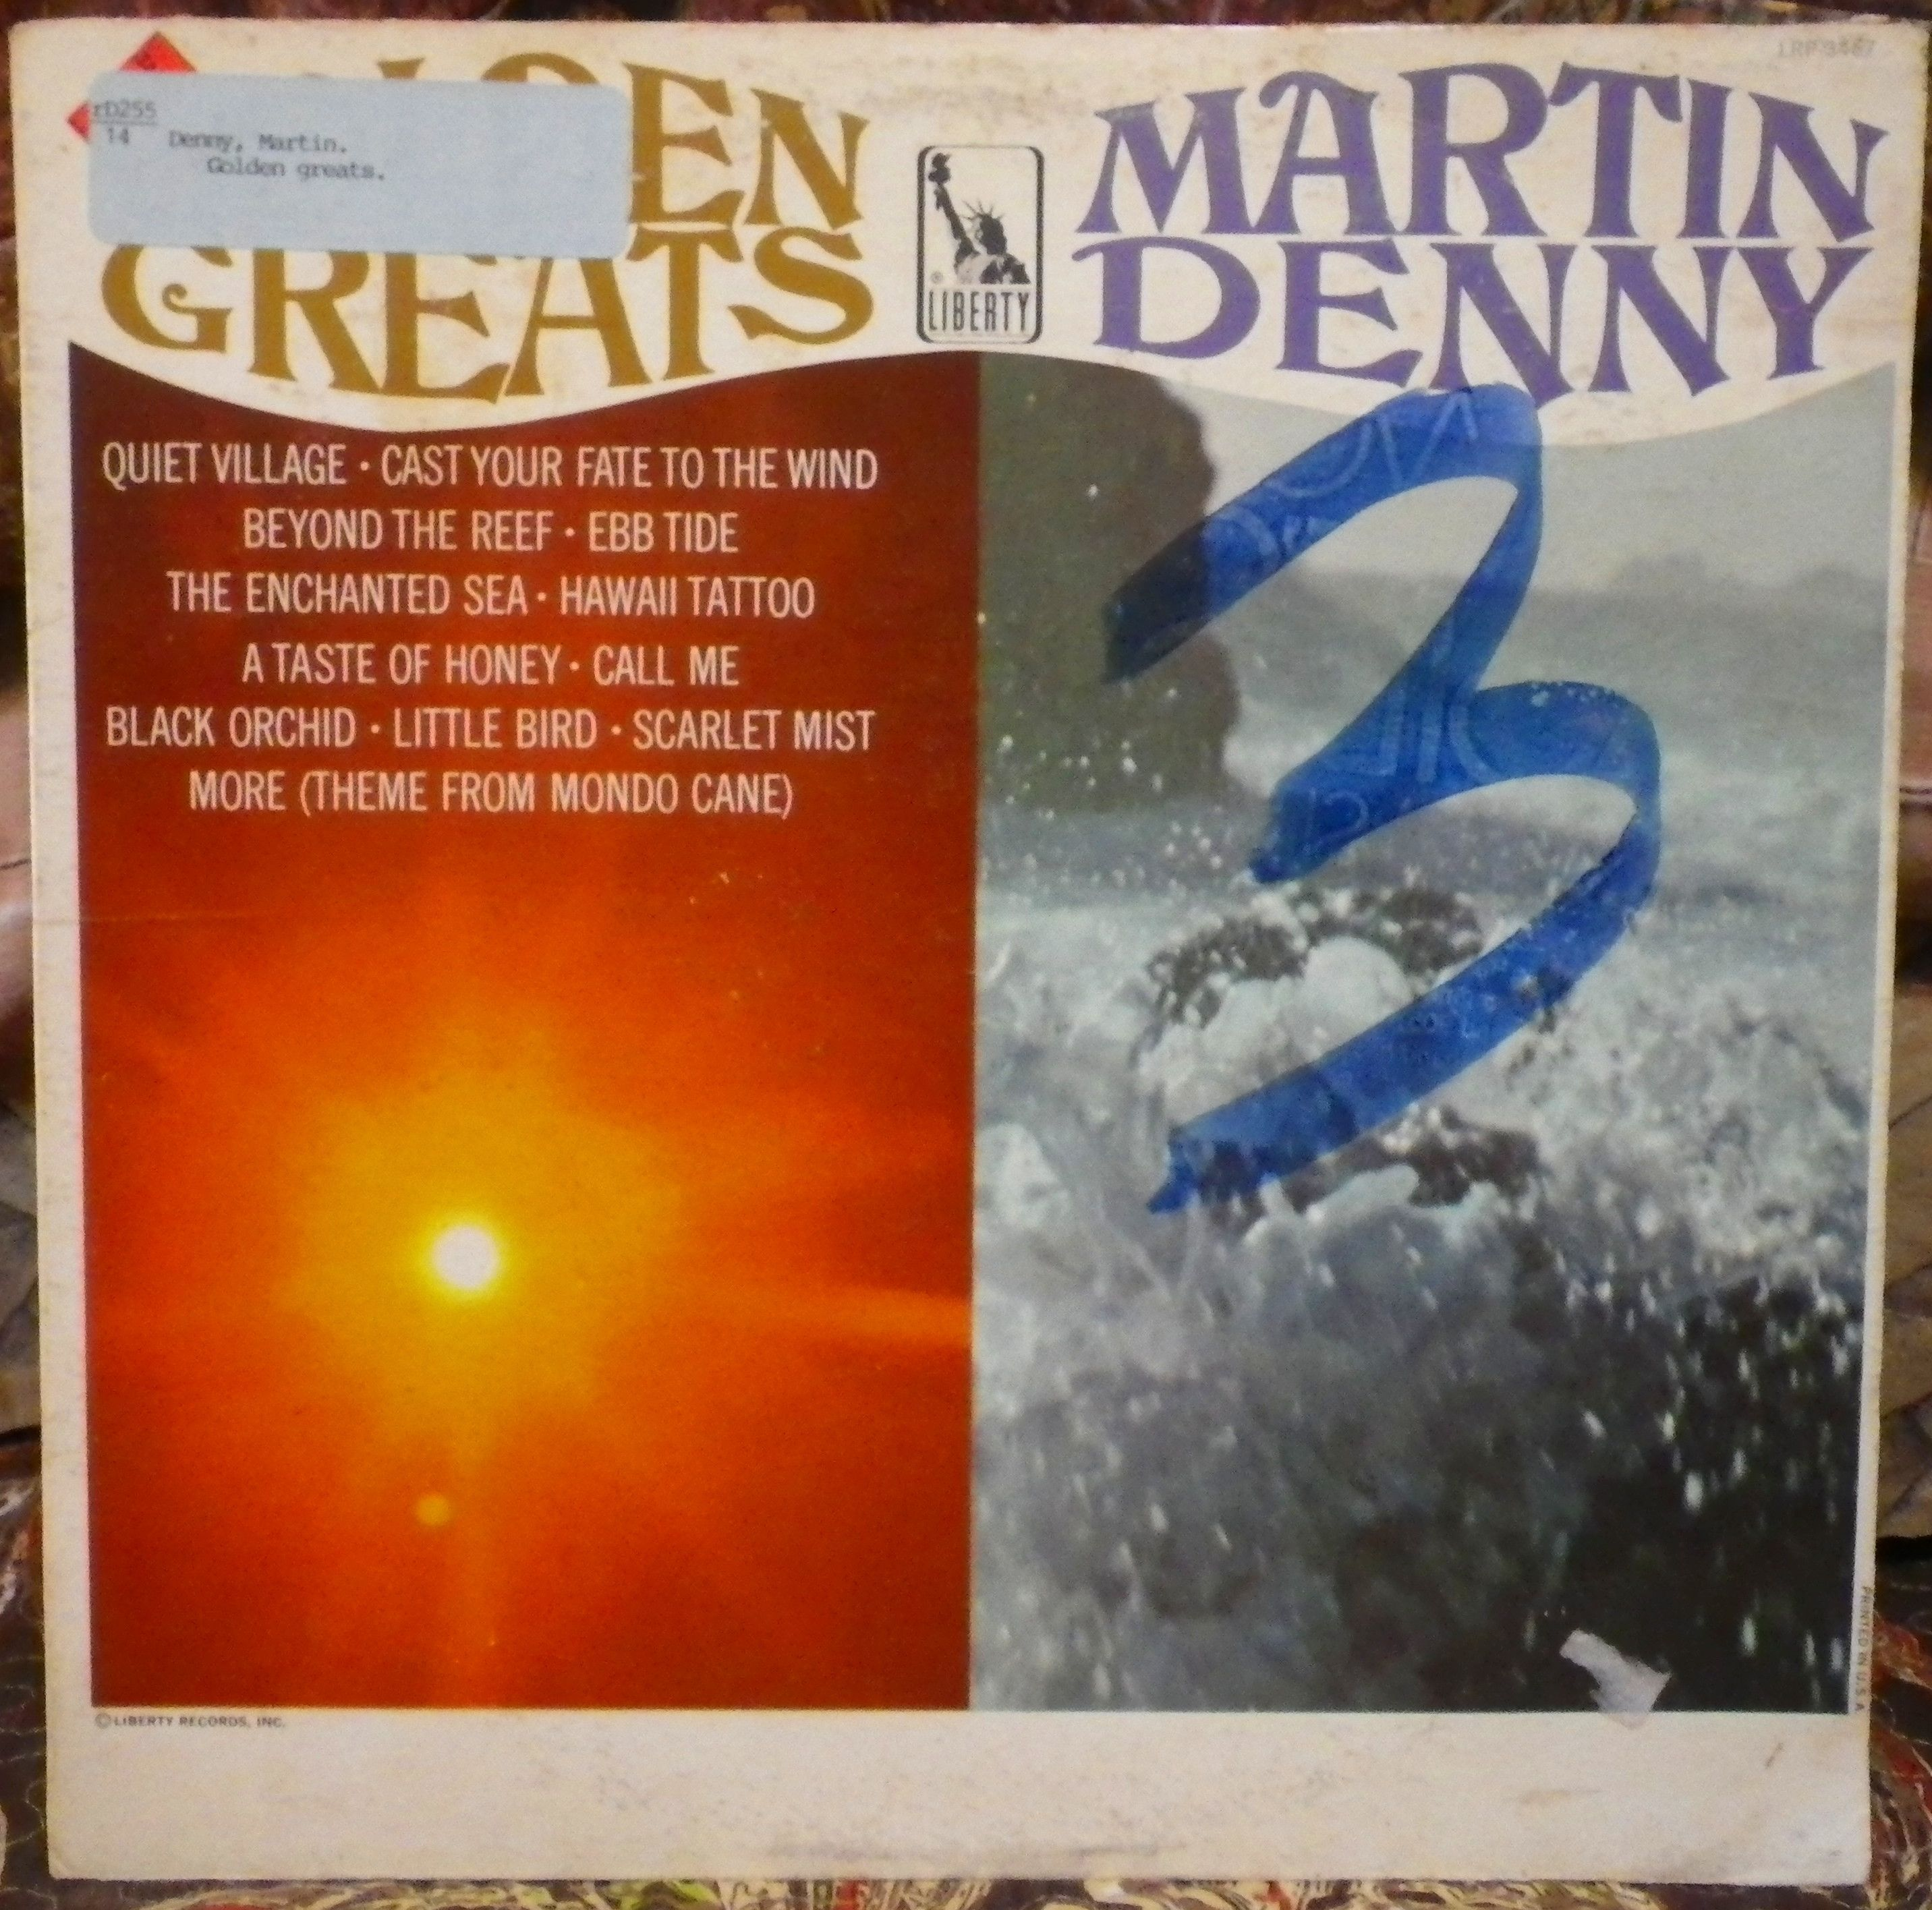 medium resolution of martin denny golden greats los angeles calif liberty records lrp 3467 mono no date exotica record my hawaiian exotica record collection